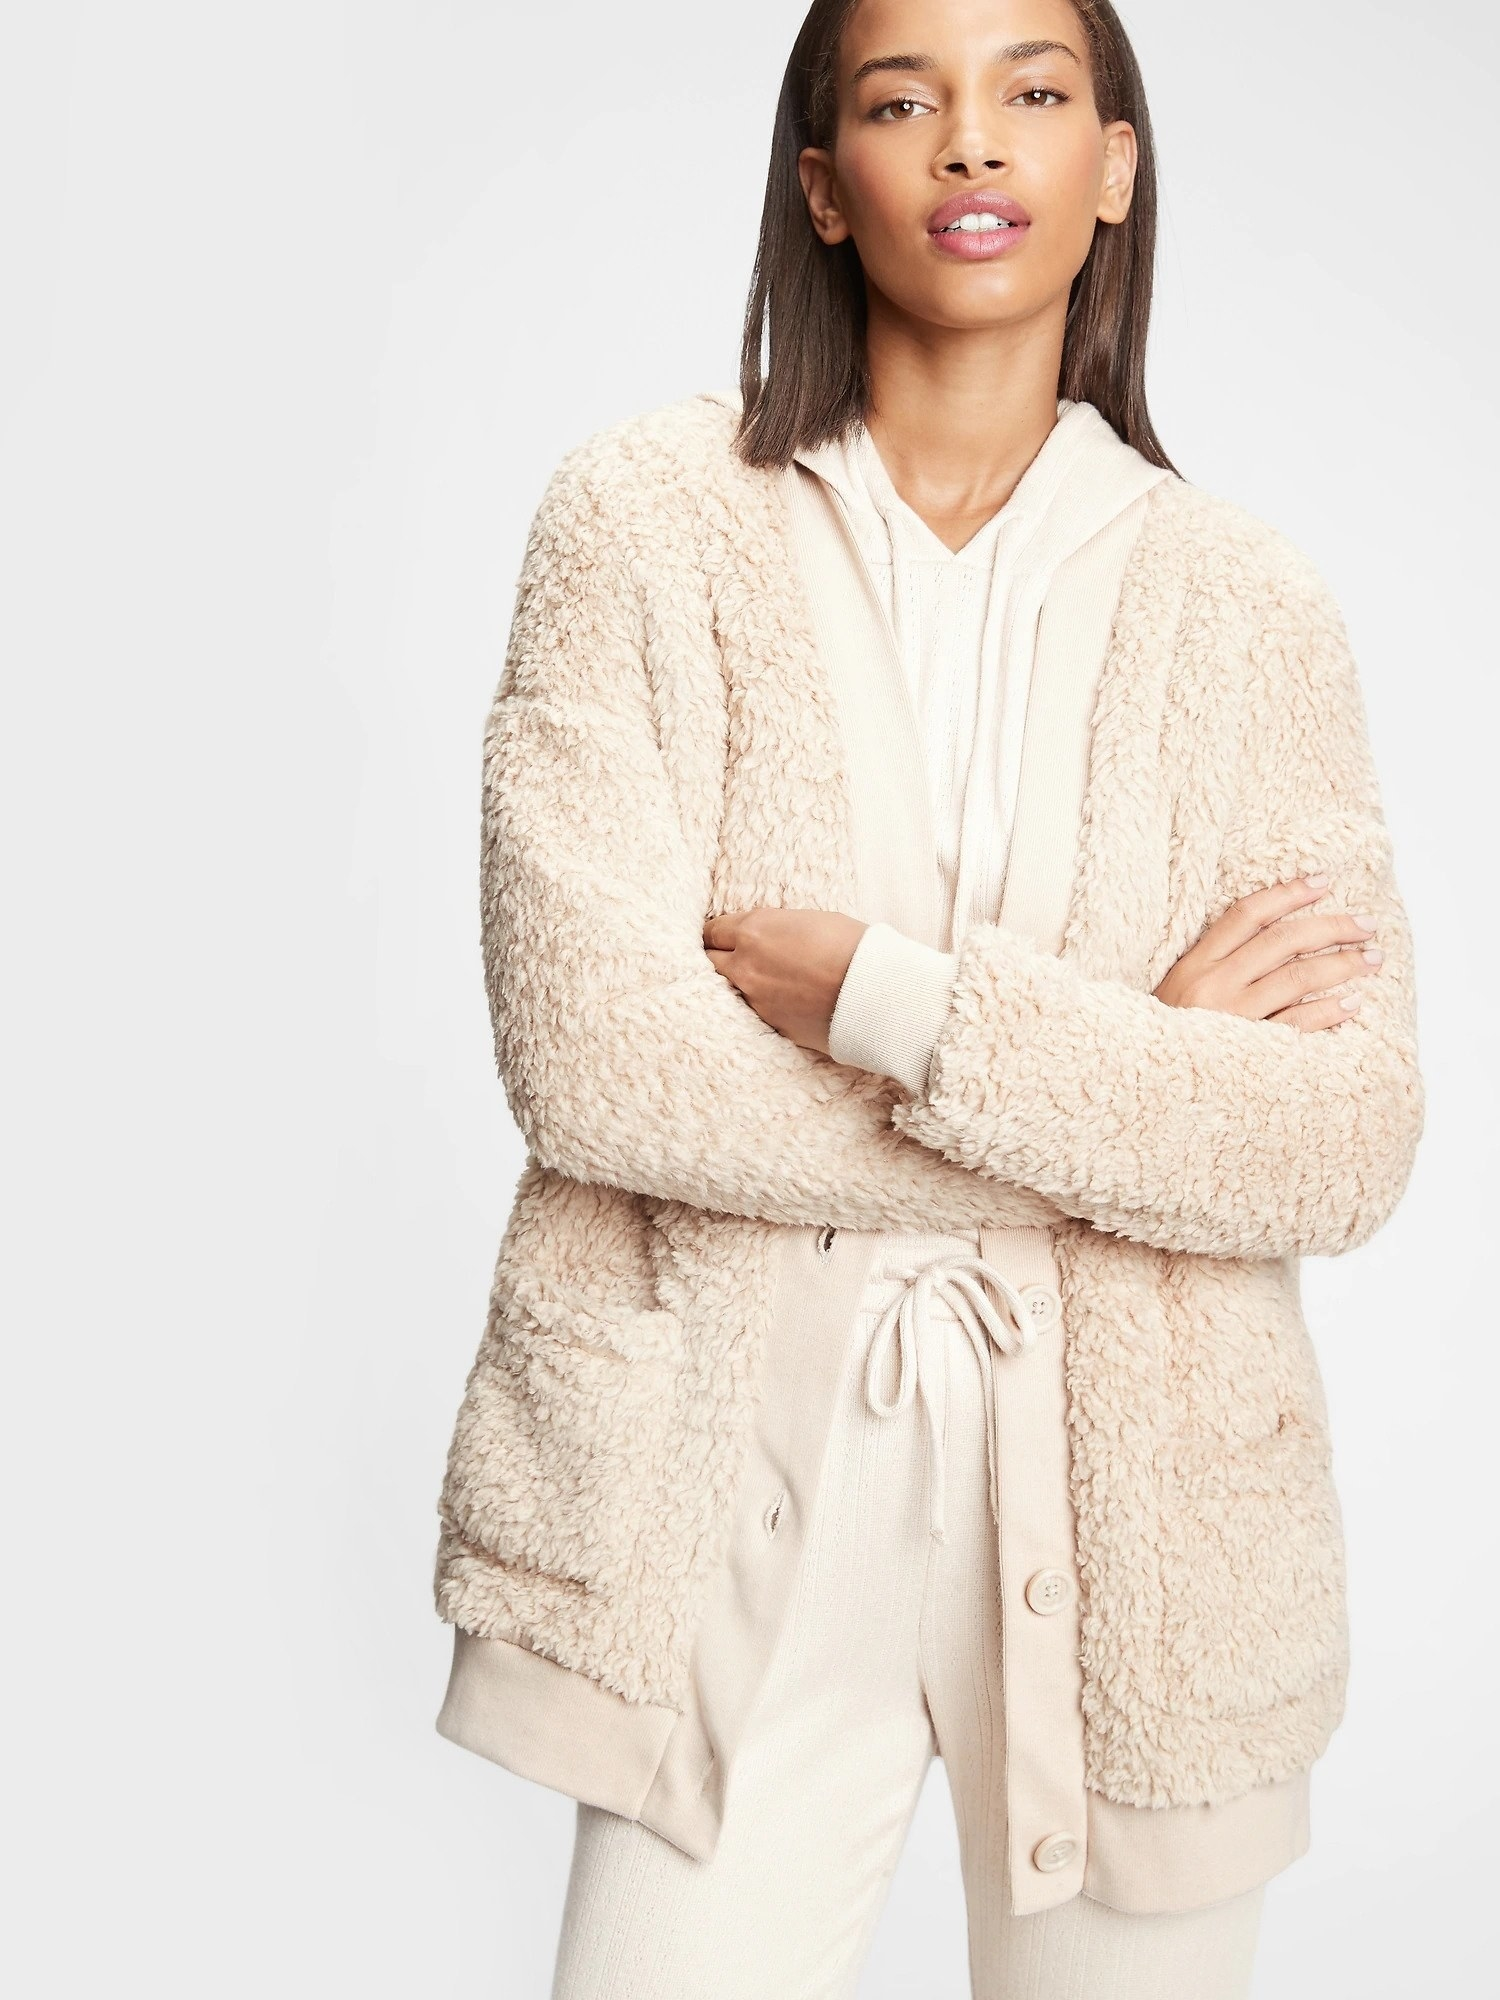 Model wearing sherpa cardigan